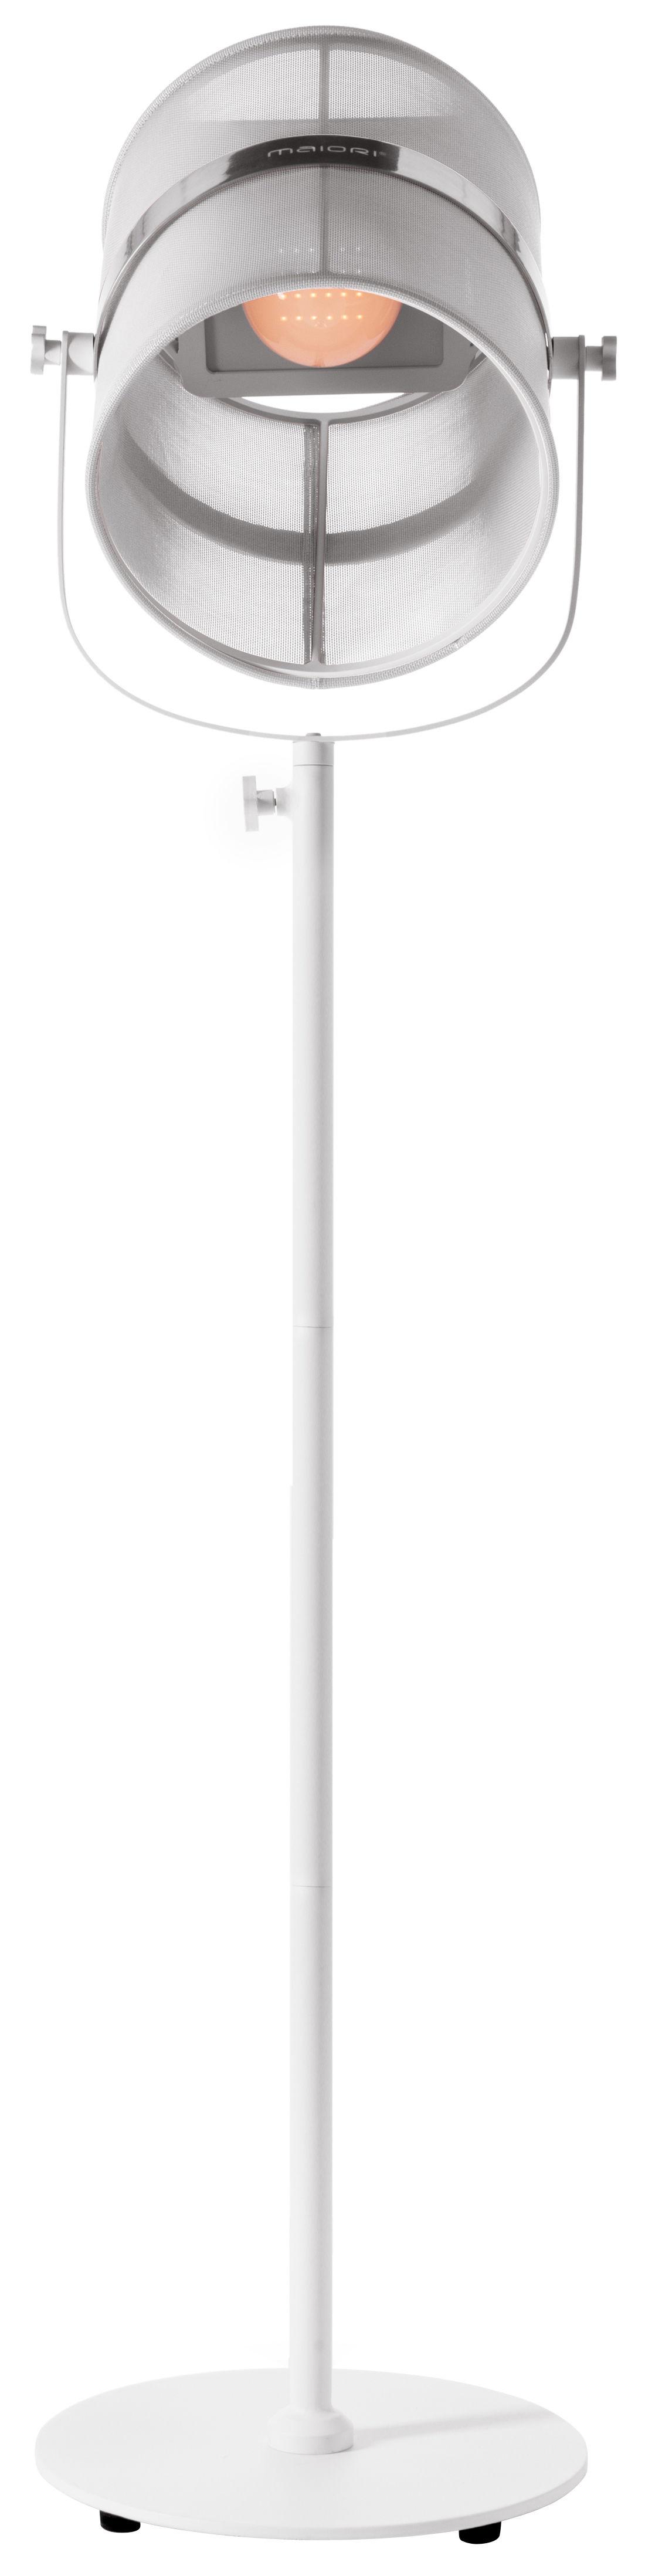 lampadaire solaire la lampe paris led sans fil blanc pied blanc maiori made in design. Black Bedroom Furniture Sets. Home Design Ideas